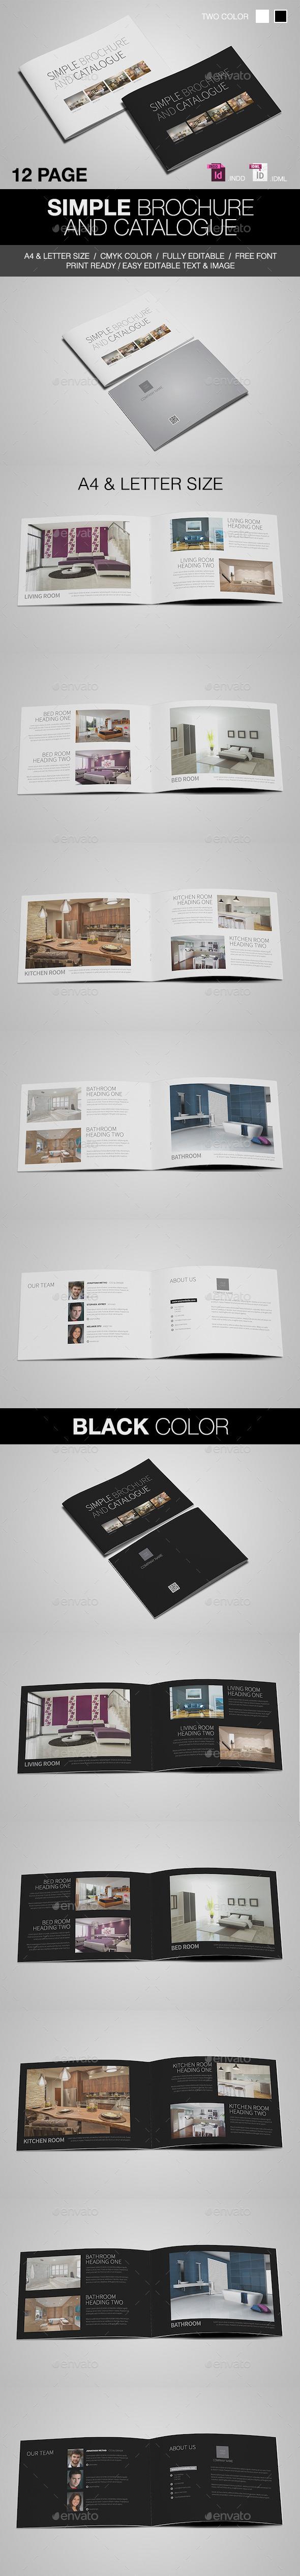 Simple Catalogue/Brochure - Brochures Print Templates